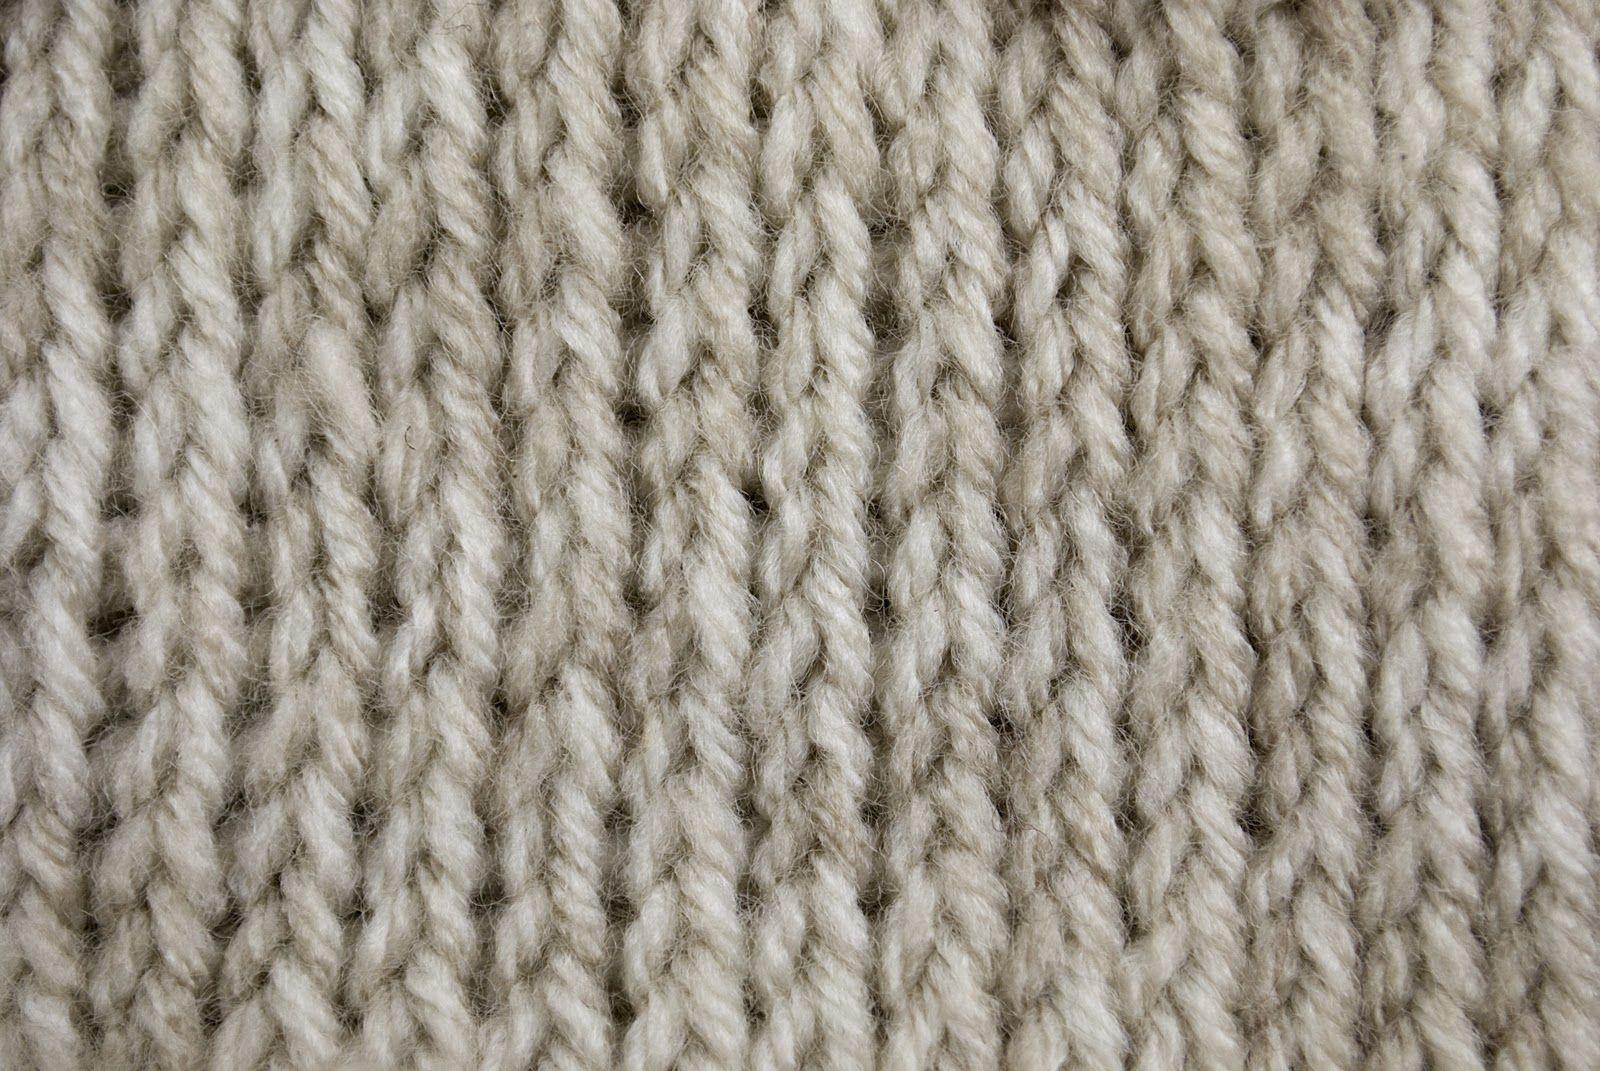 Tunisian Crochet: Tunisian Knit Stitch (Tks) | Crochet | Pinterest ...